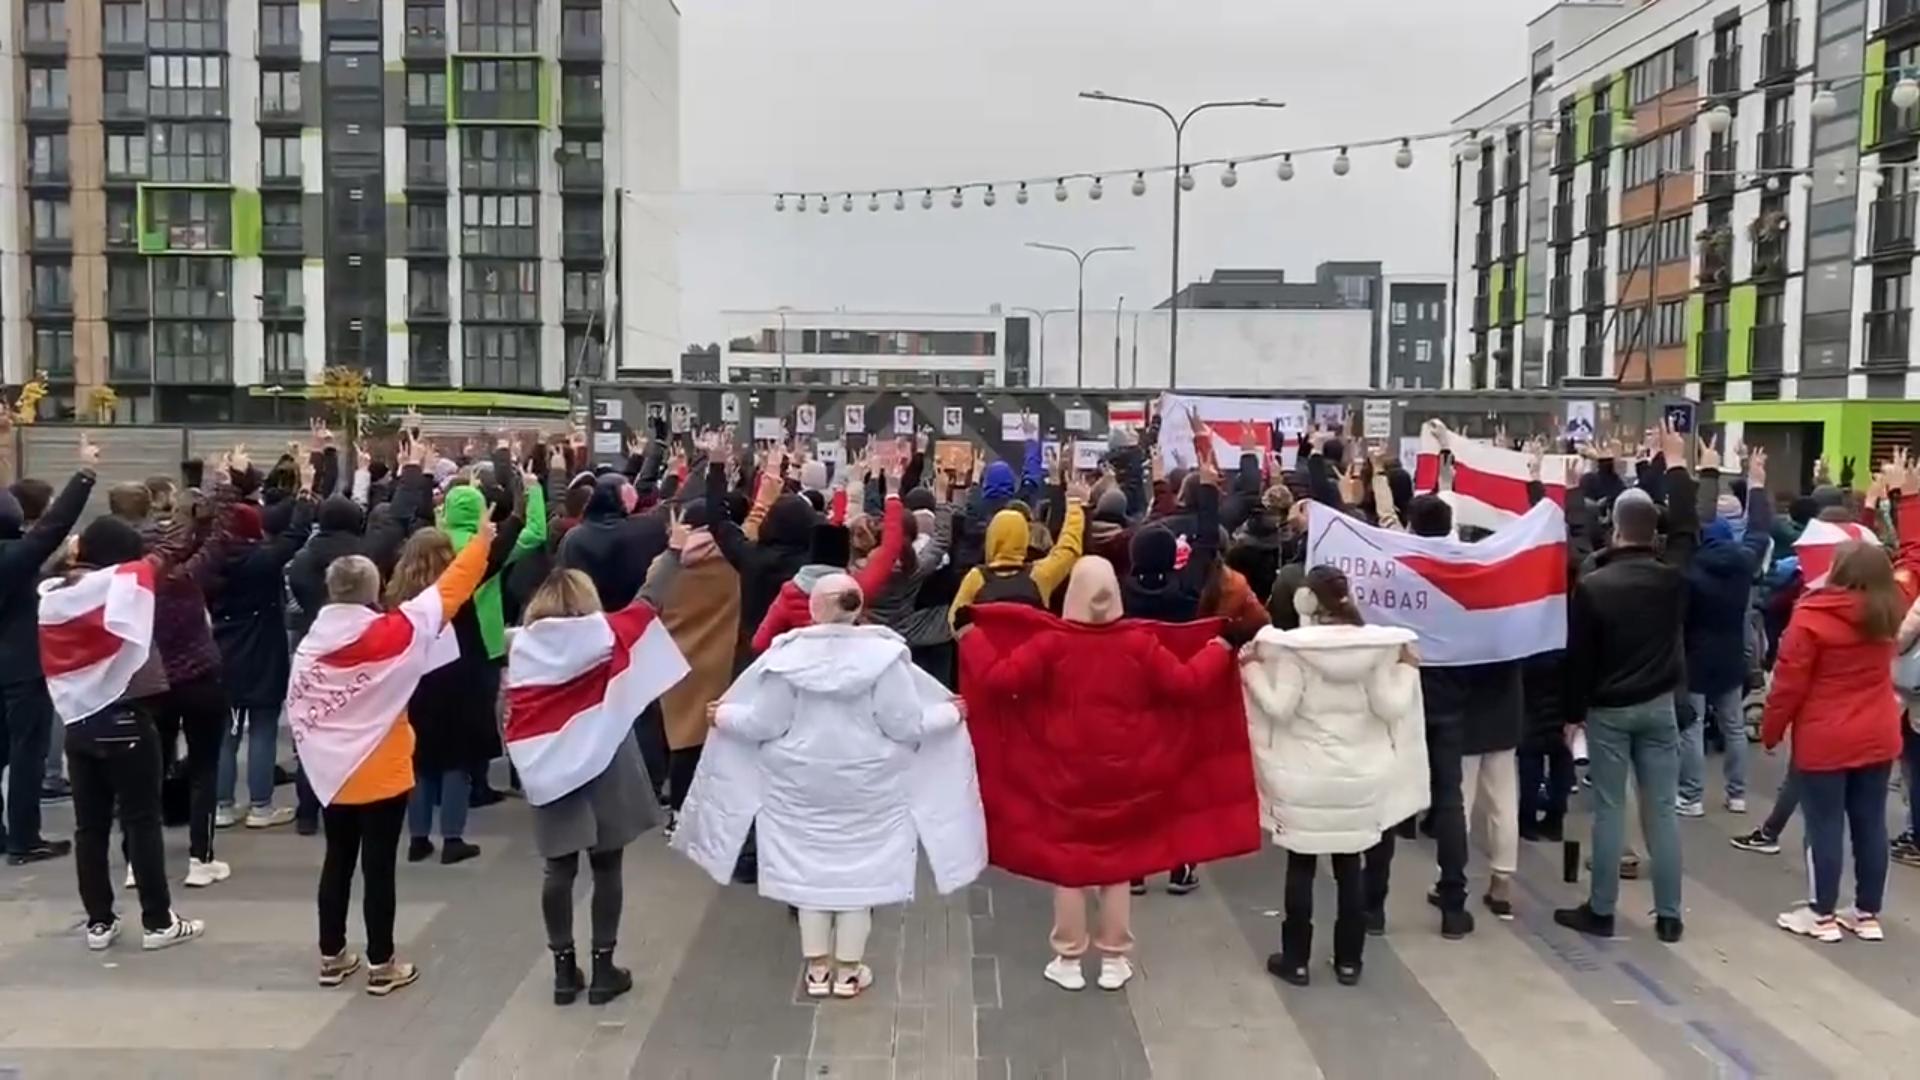 В Белоруссии бастуют предприятия: власти отрицают начало забастовок